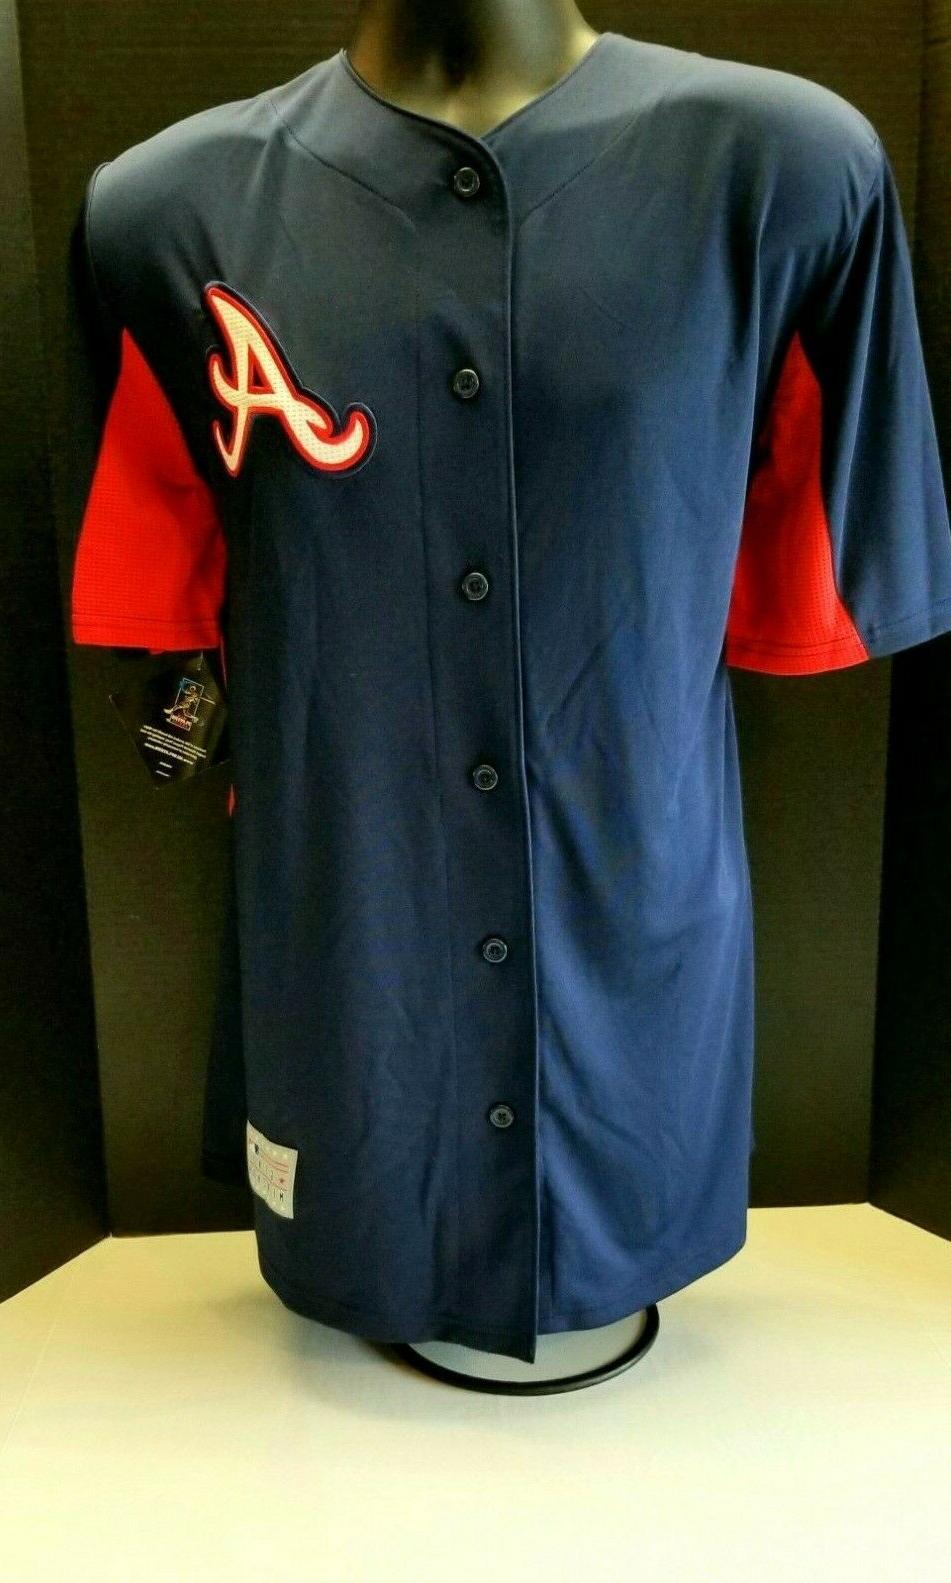 freddie freeman atlanta braves adult stitched jersey